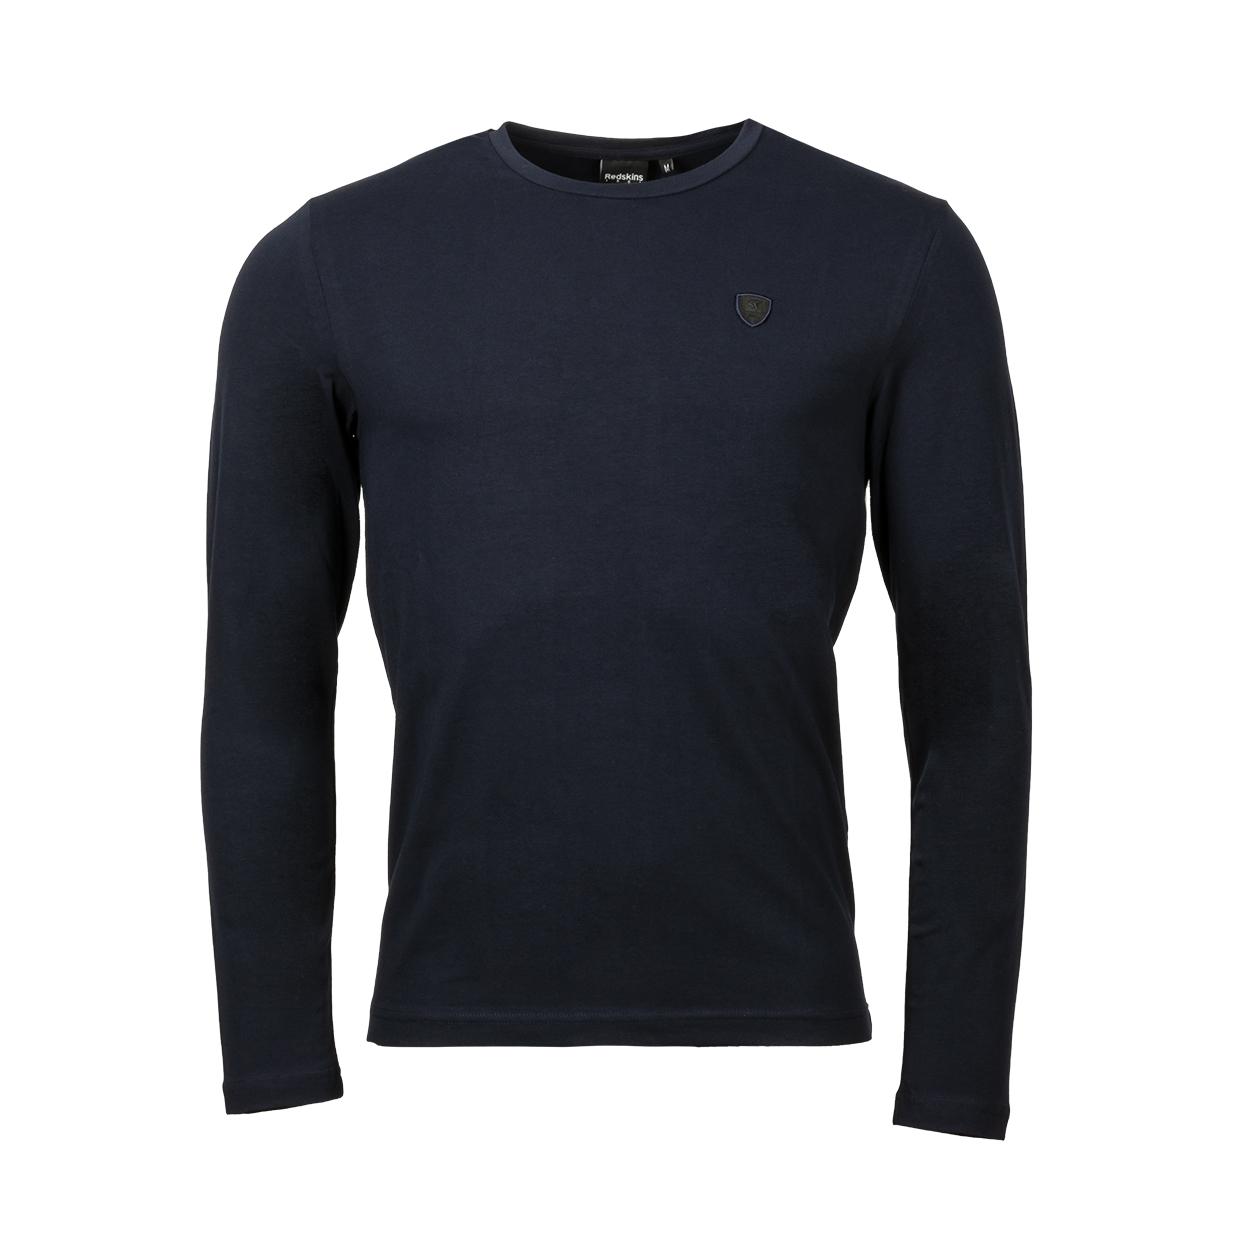 Tee-shirt col rond  reiner en coton stretch bleu marine